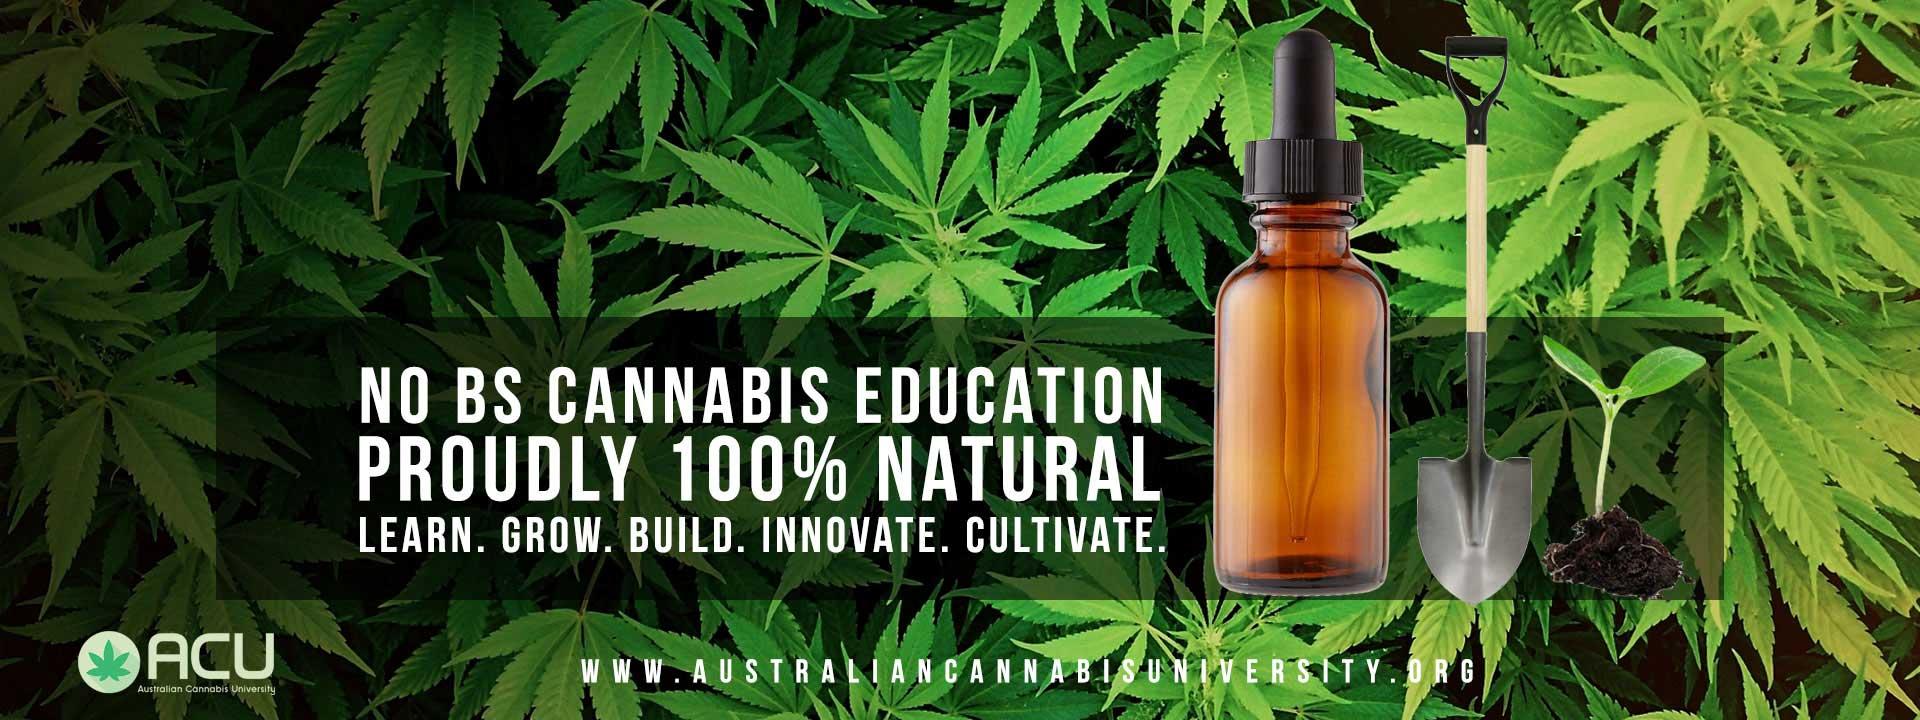 Australian Cannabis University